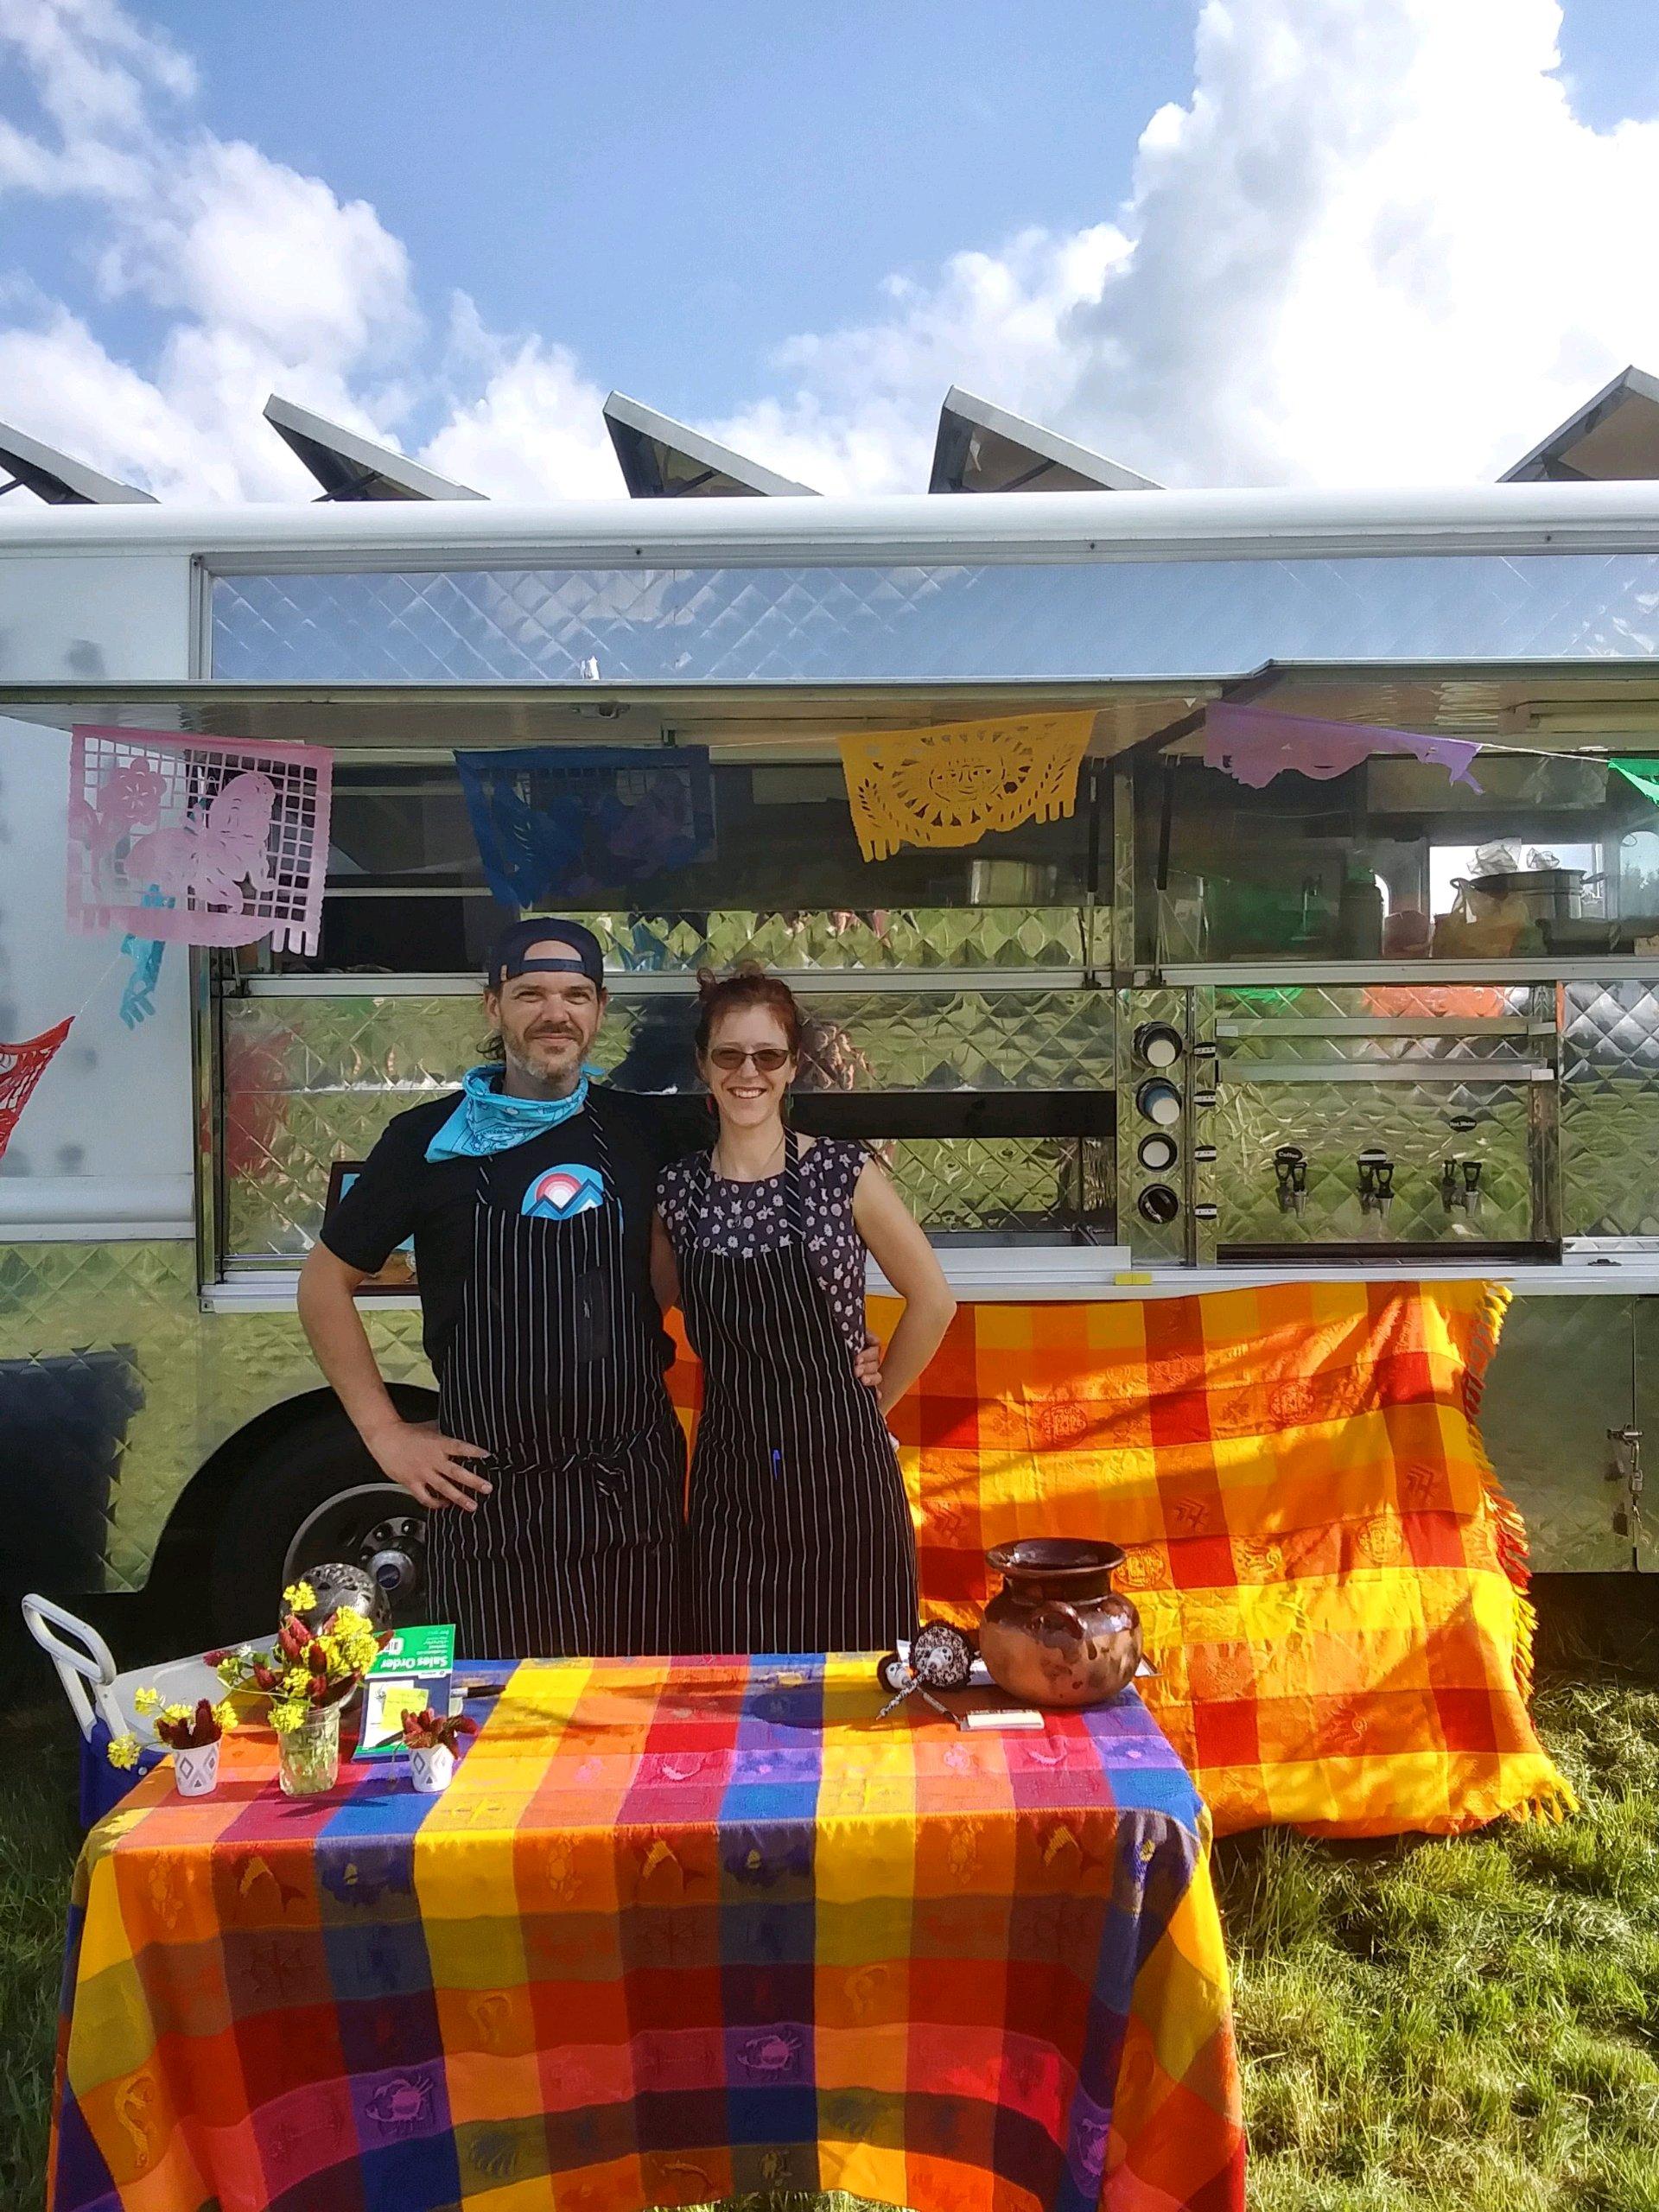 Rodrigo and Mary, husband and wife, chef/owners of Comida KIN food truck in Hillsboro, OR